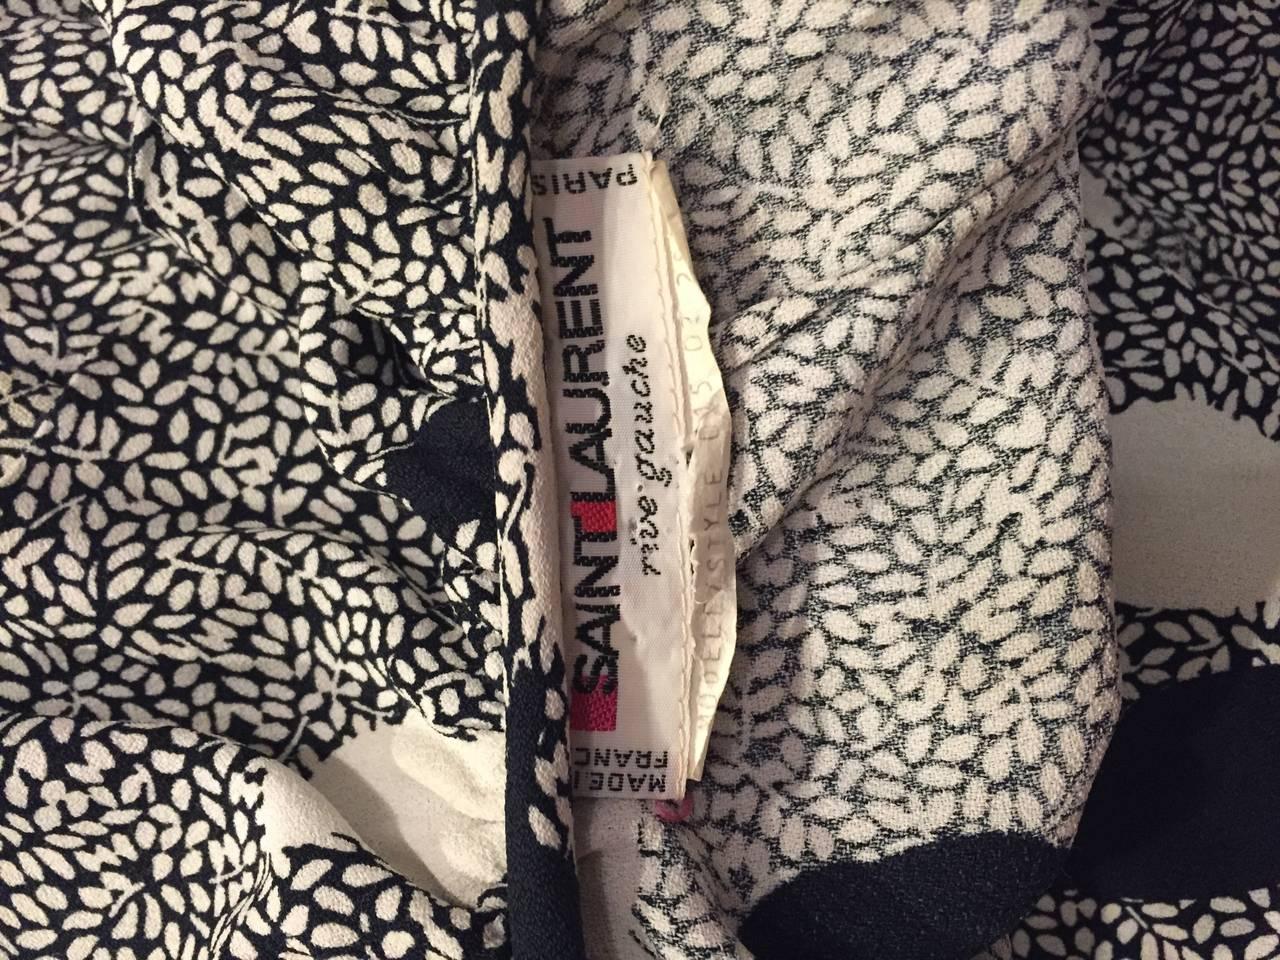 Vintage Yves Saint Laurent 1980s ' Rive Gauche ' Black + White Leaf Dress & Sash For Sale 6